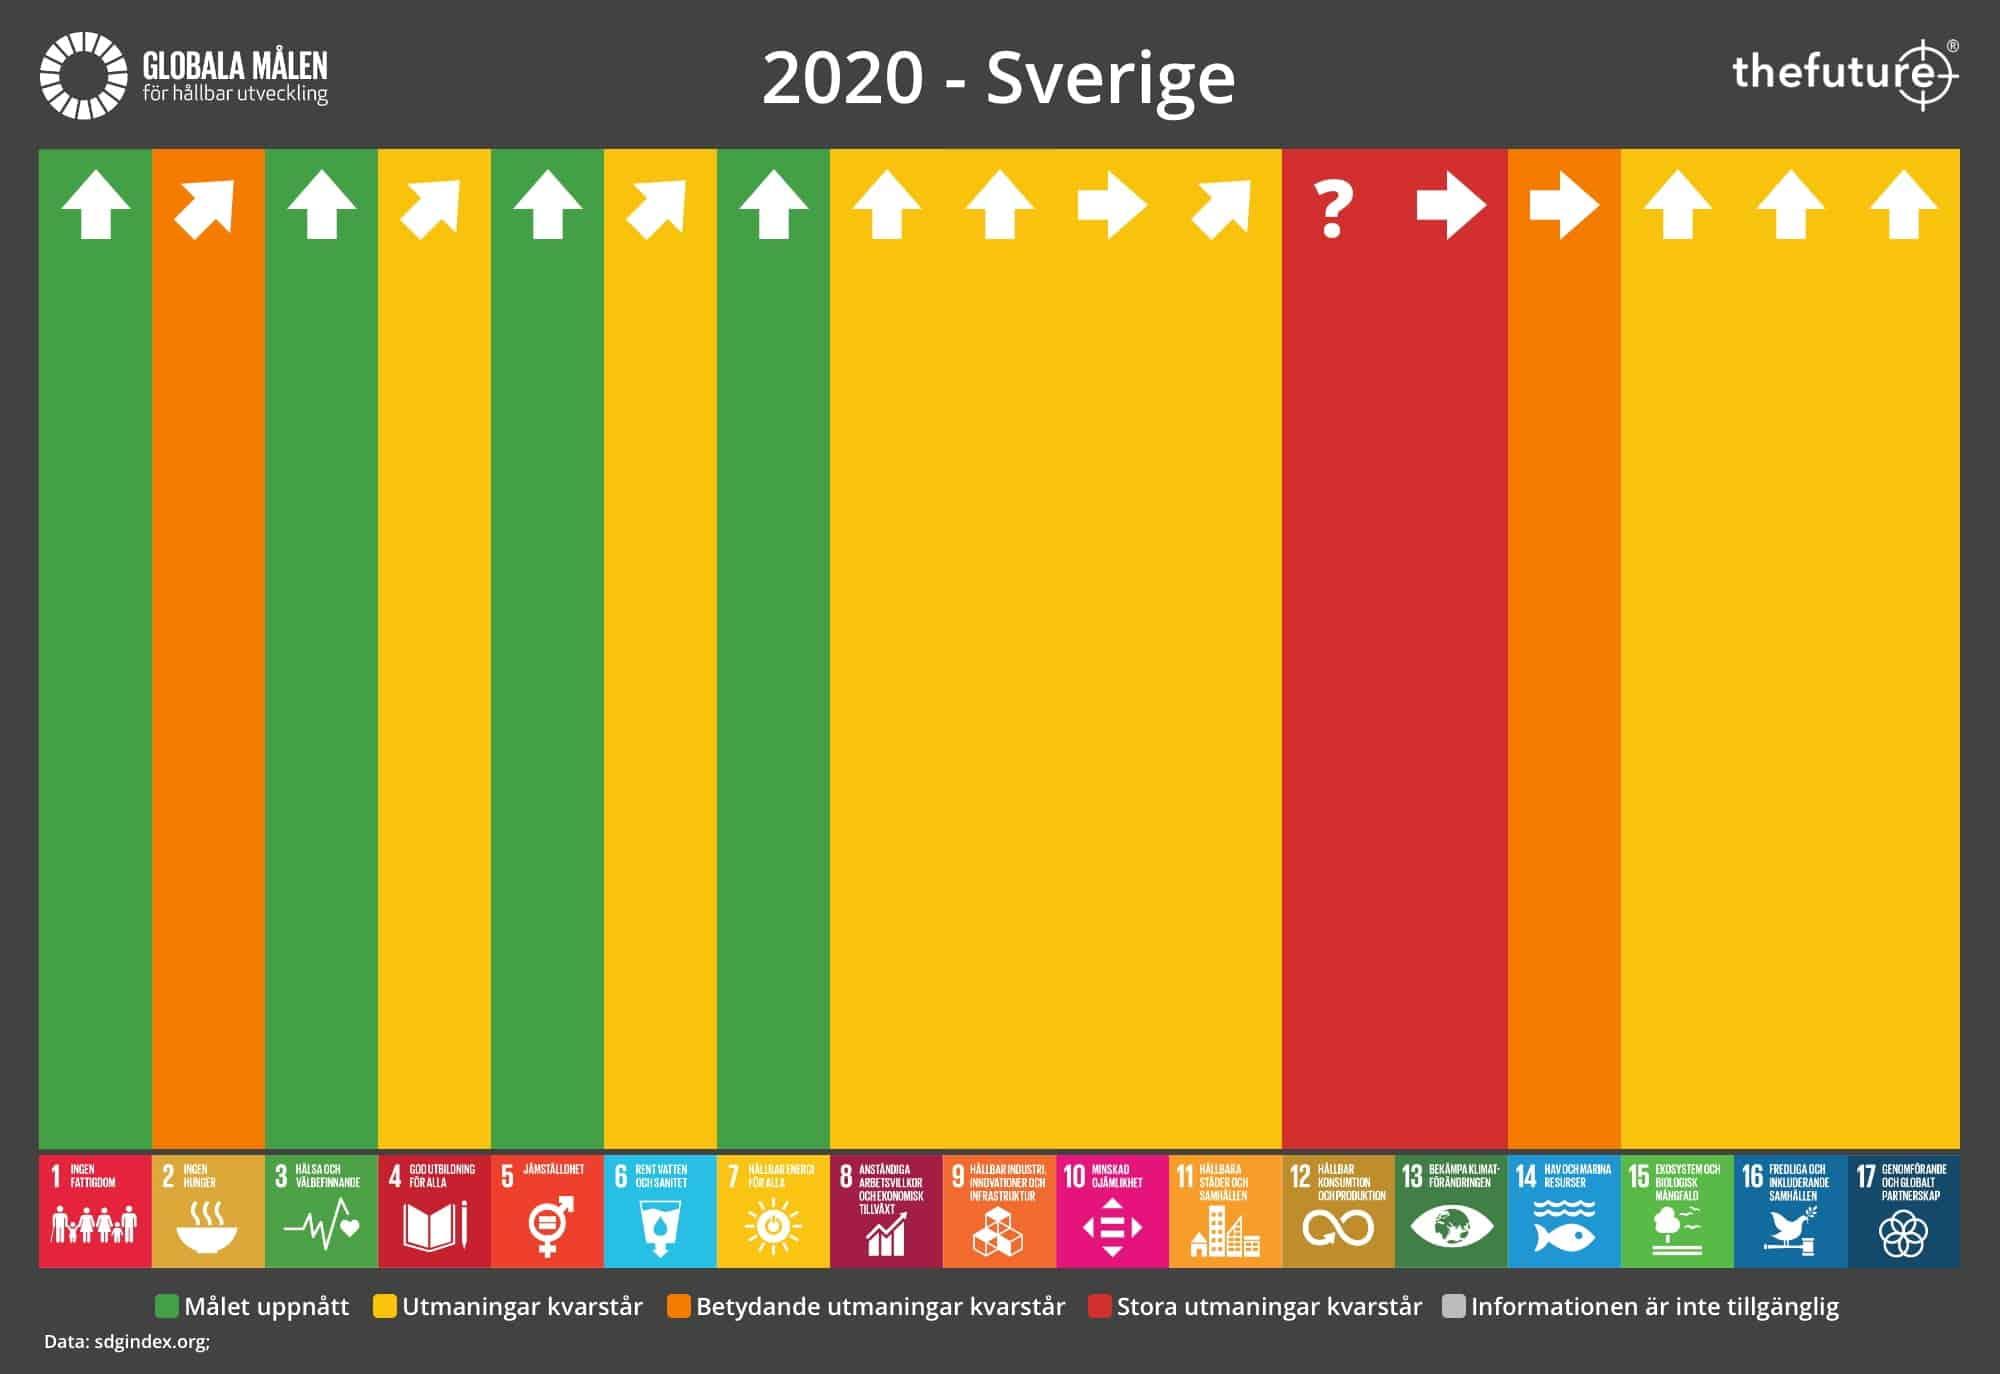 thefuture, blogg, SDG-Progress-2020-Sweden